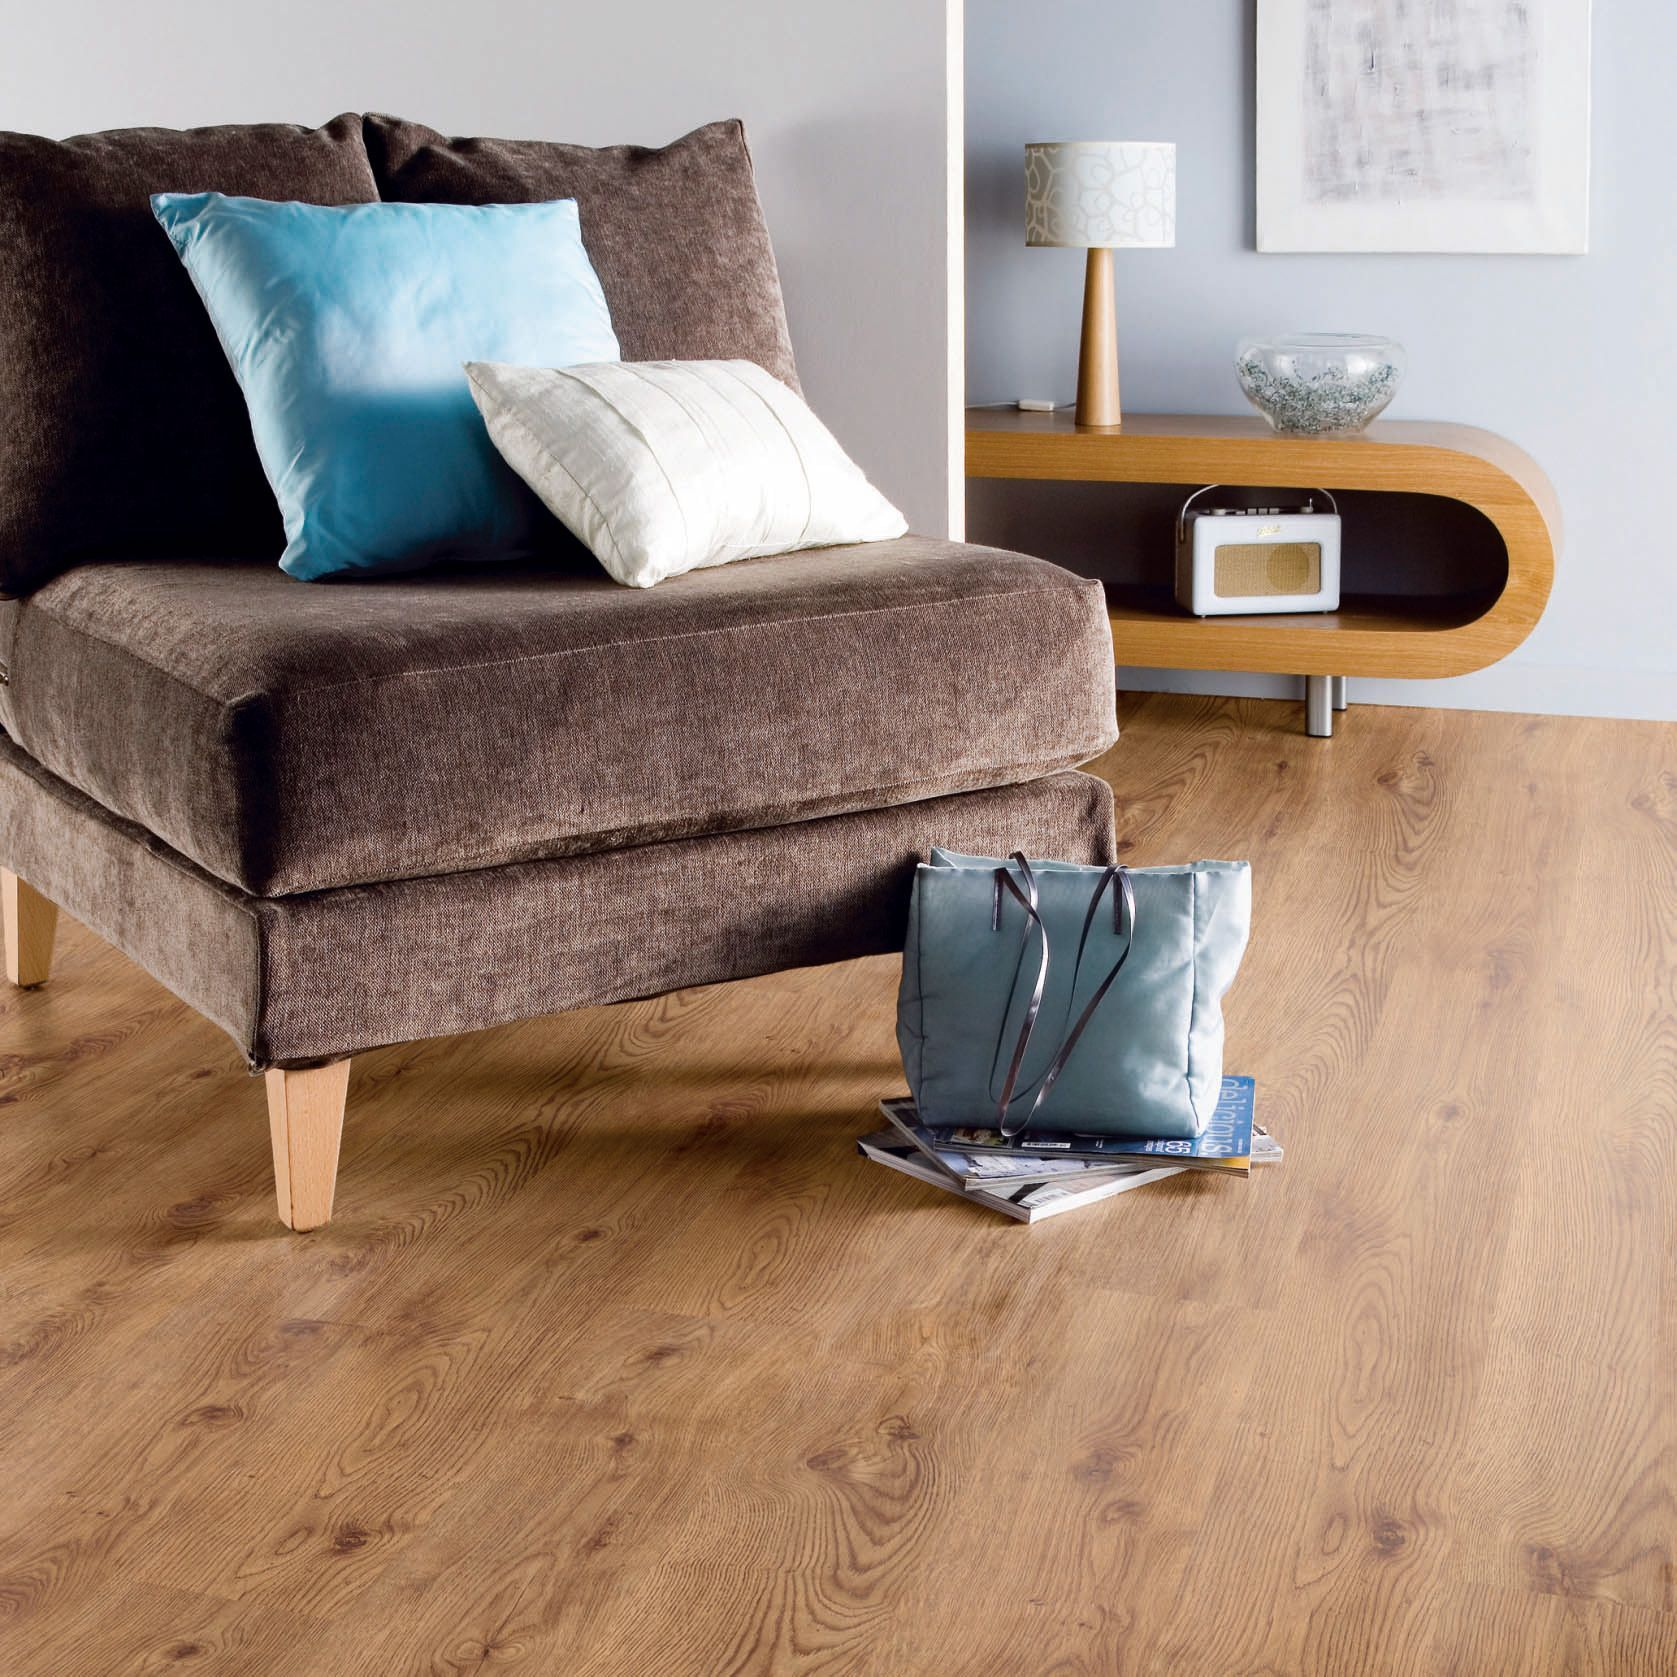 B Amp Q Country Oak Effect Glueless Laminate Flooring 2 5m 178